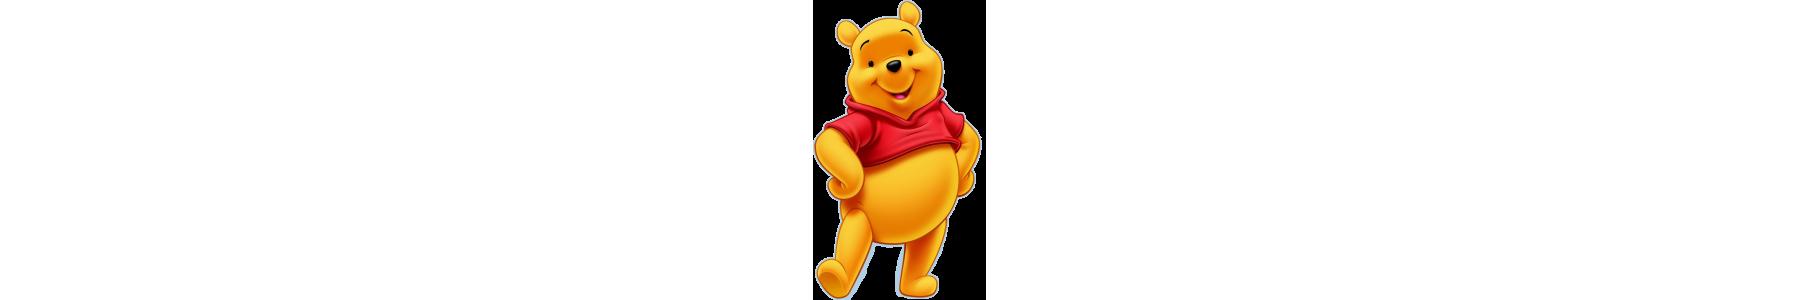 Colectia de articole party Winnie the Pooh